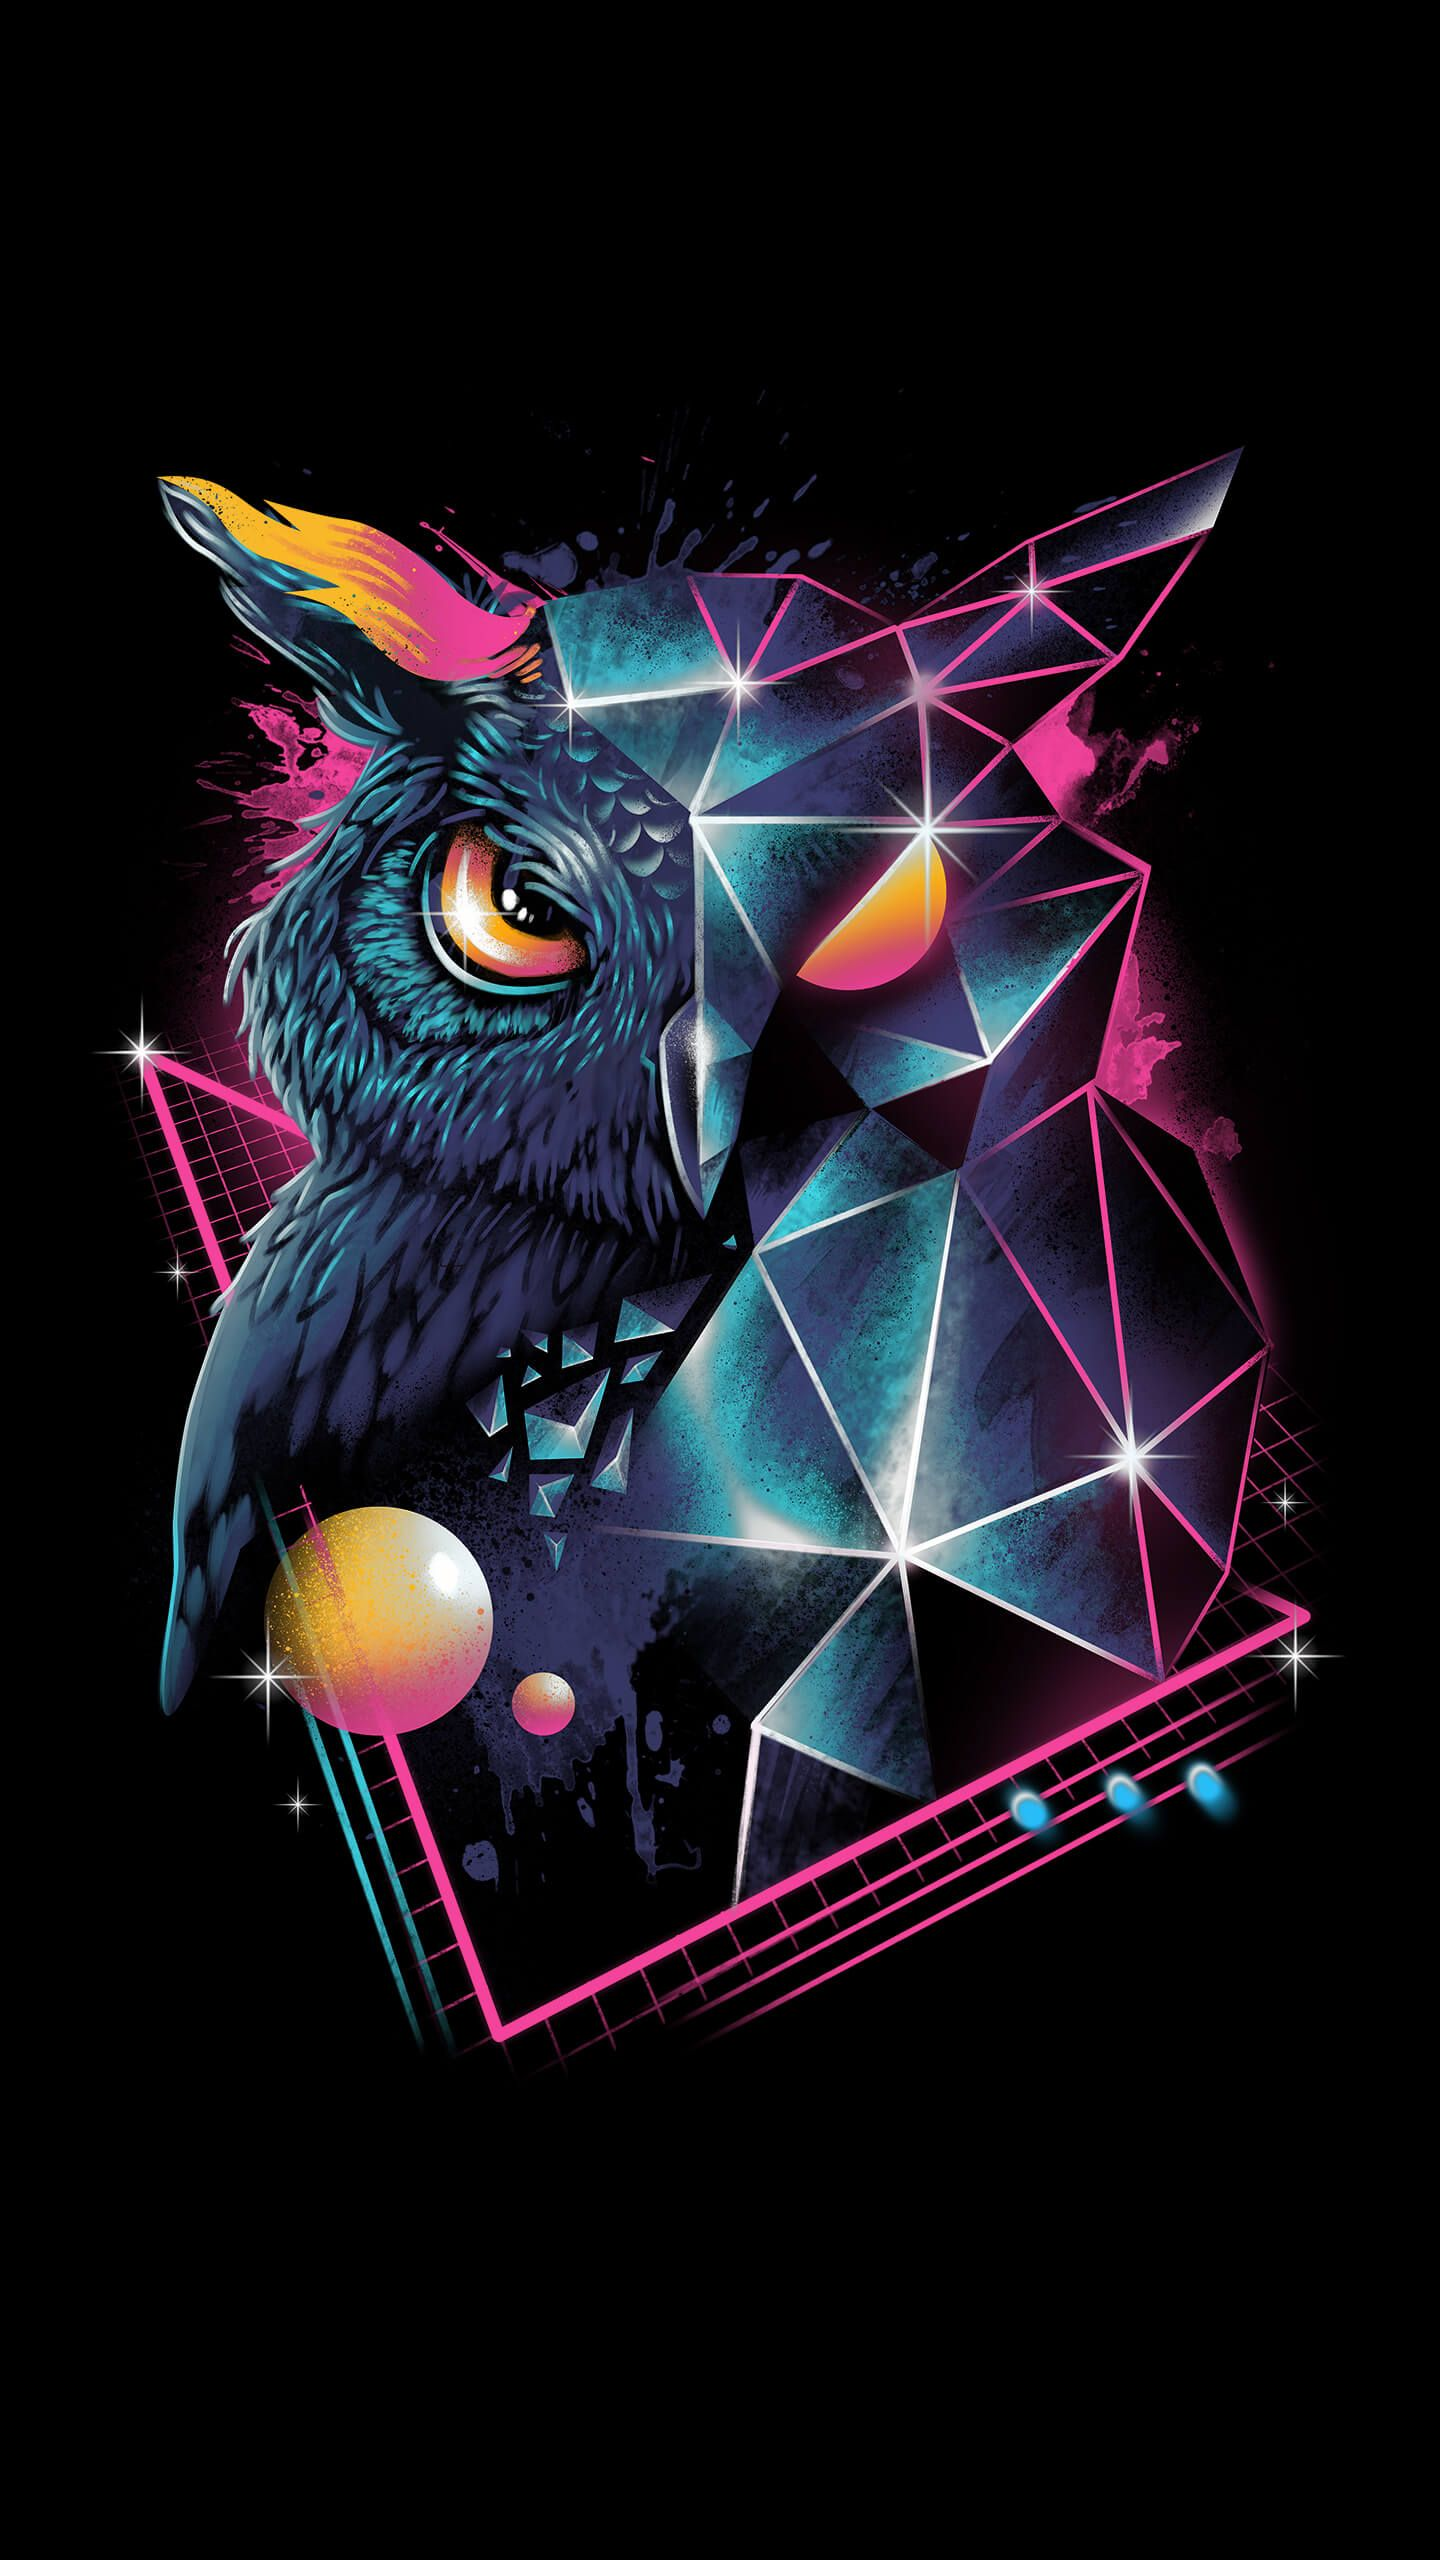 Rad Owl Owl Wallpaper Iphone Owl Wallpaper Owl Artwork